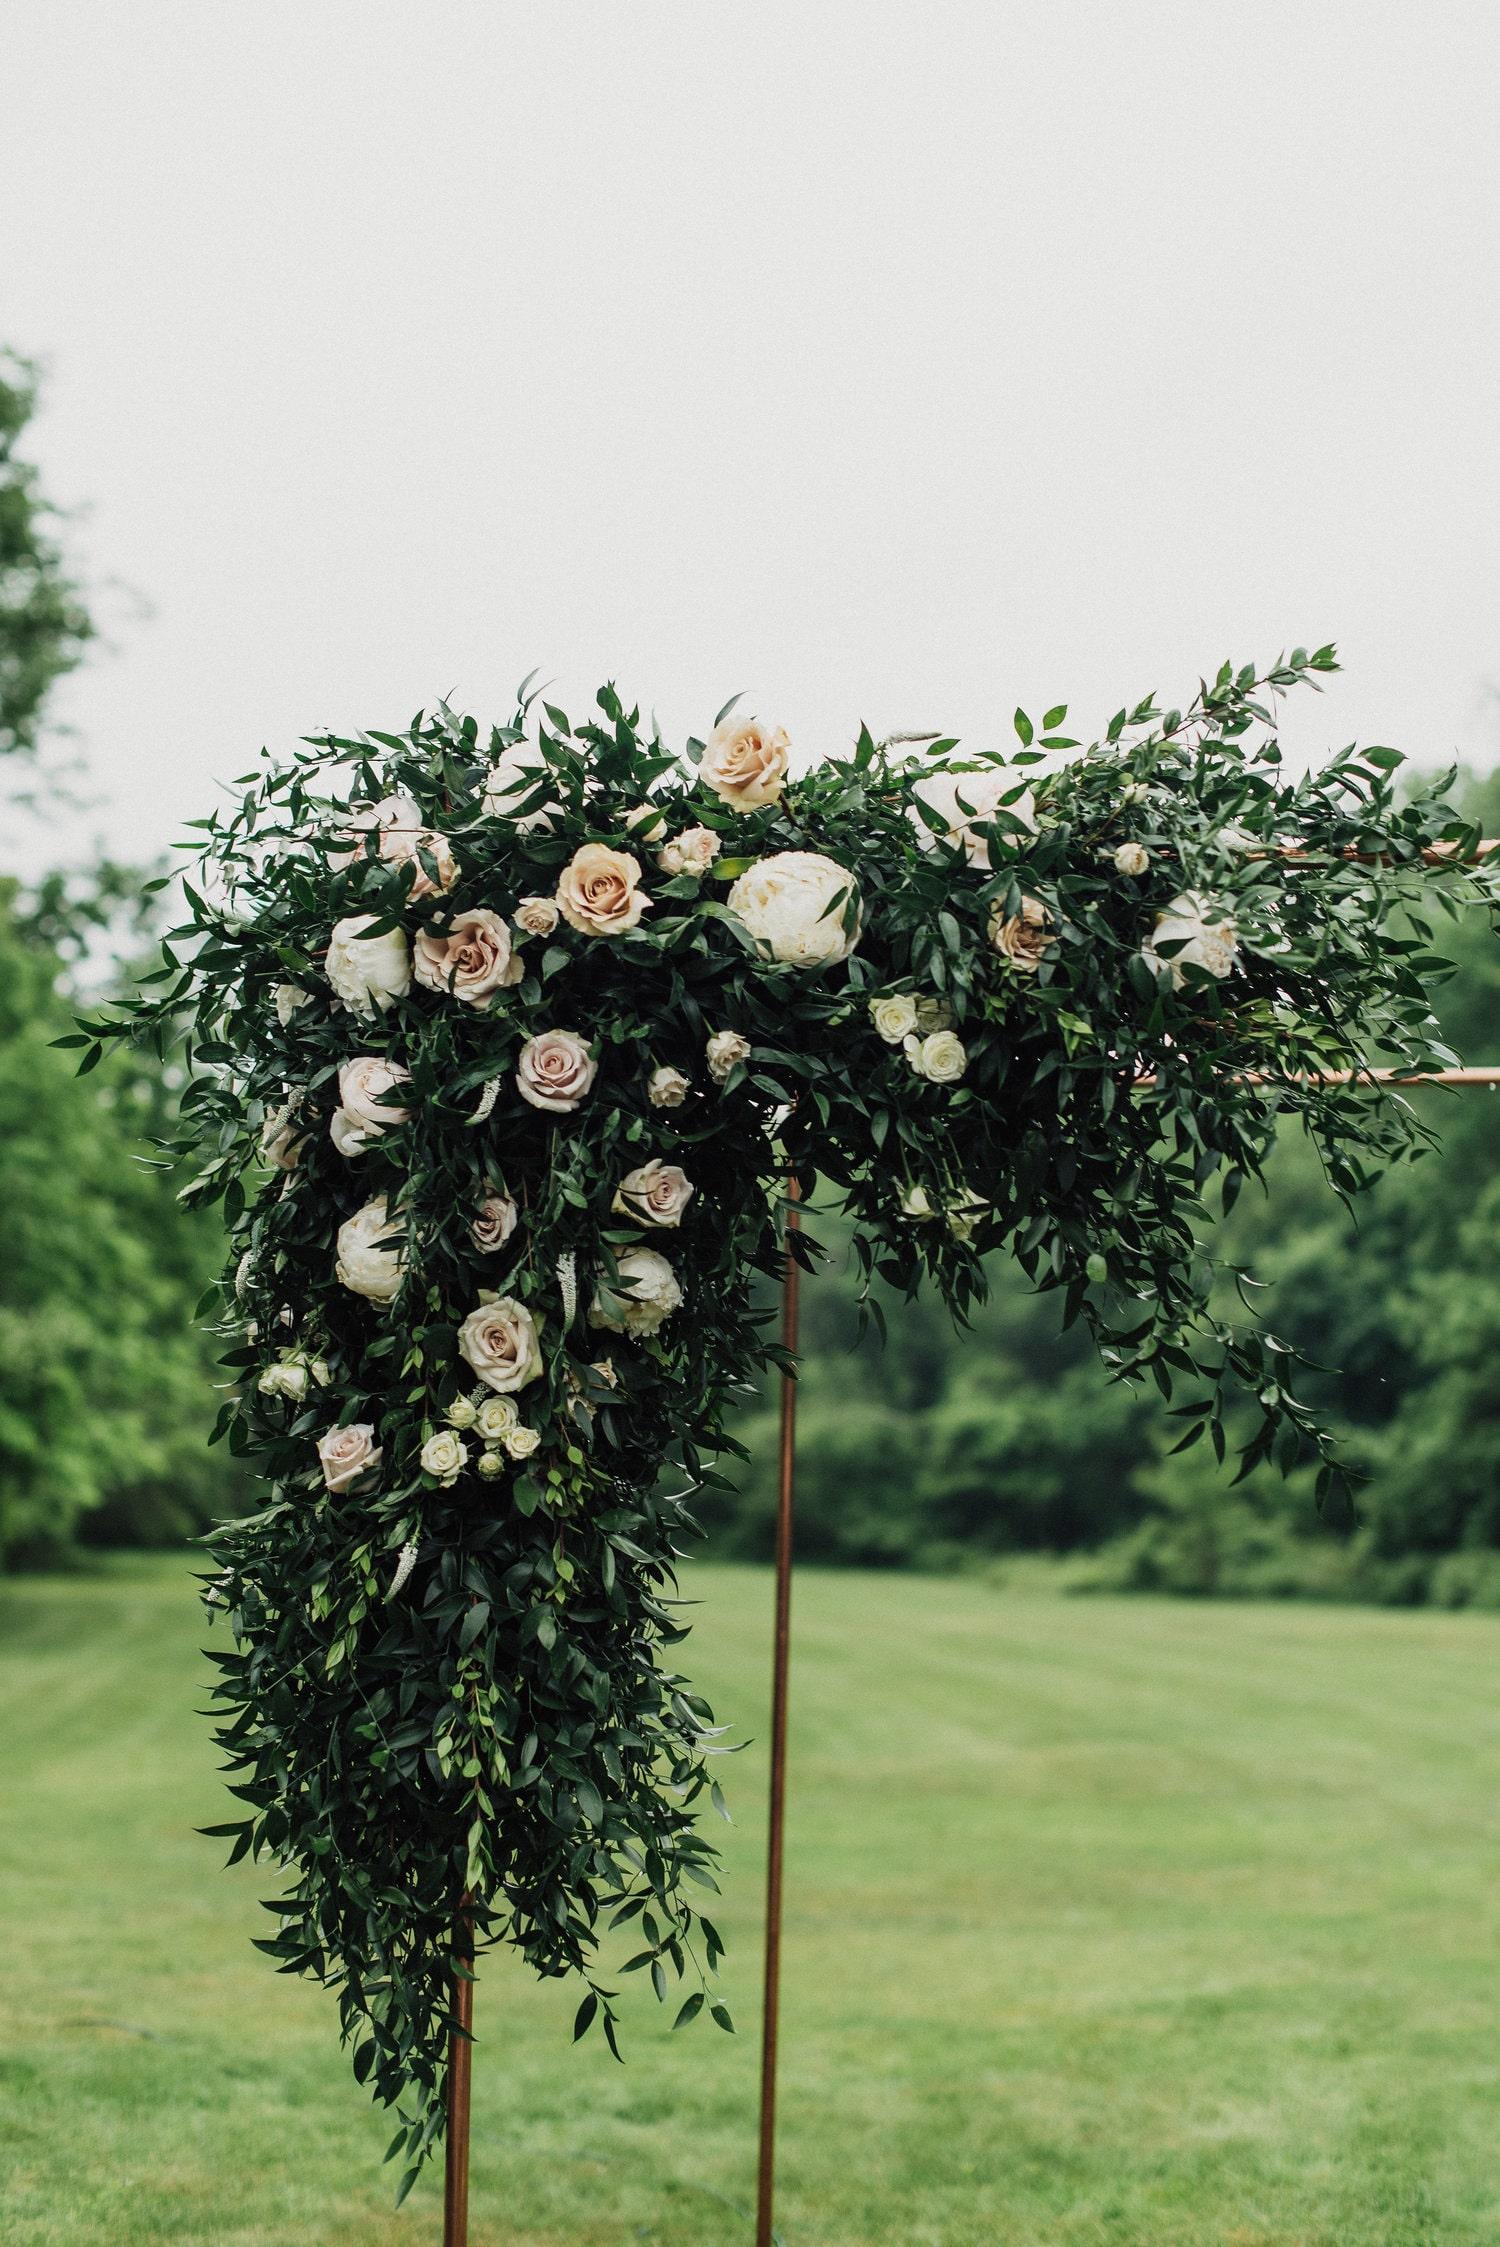 haynes-wedding-edenstraderphoto-276-min.jpg